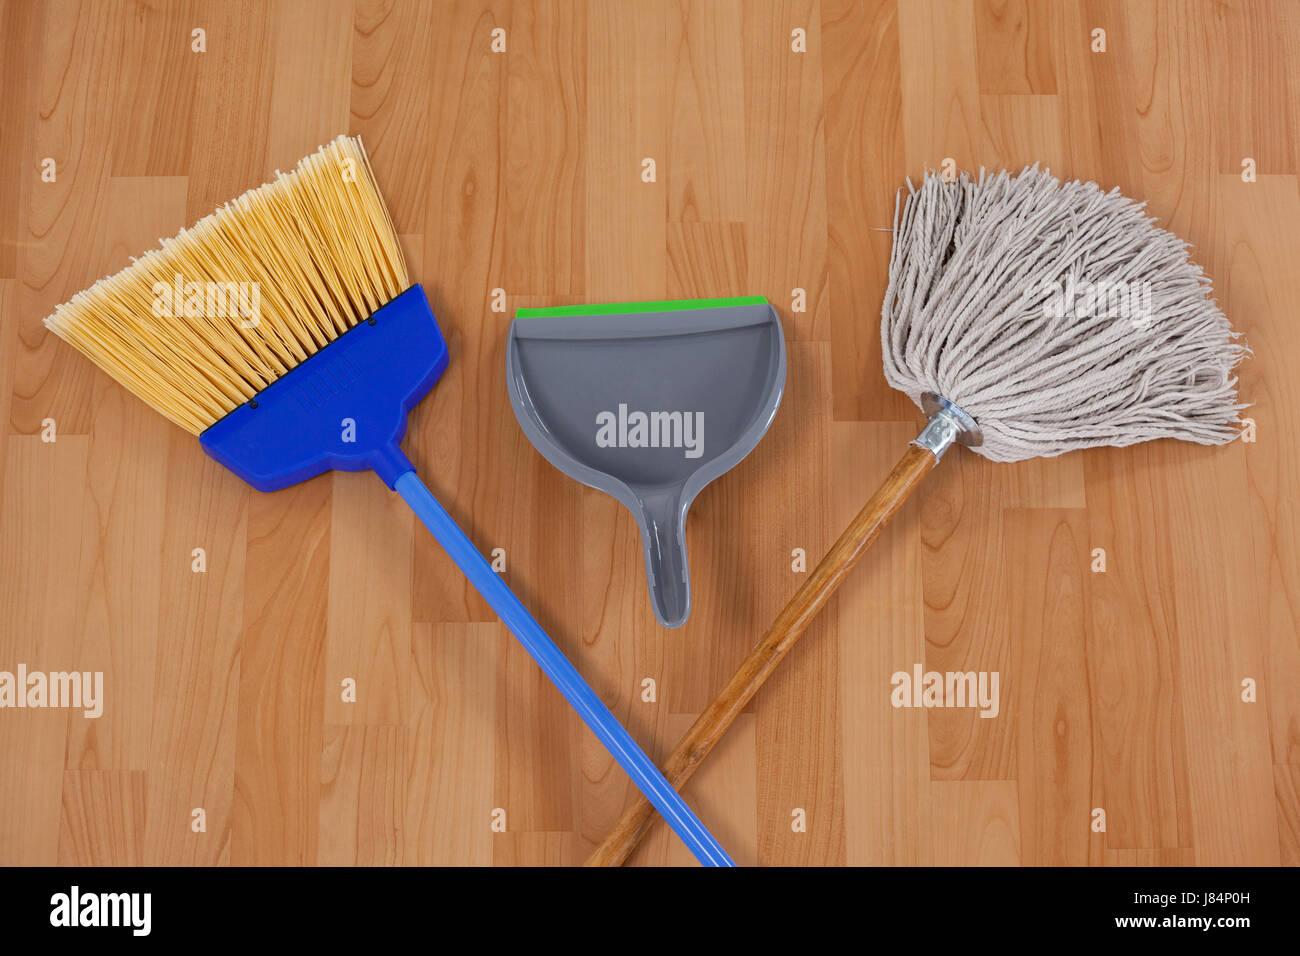 Dustpan, sweeping broom and mop on wooden floor - Stock Image